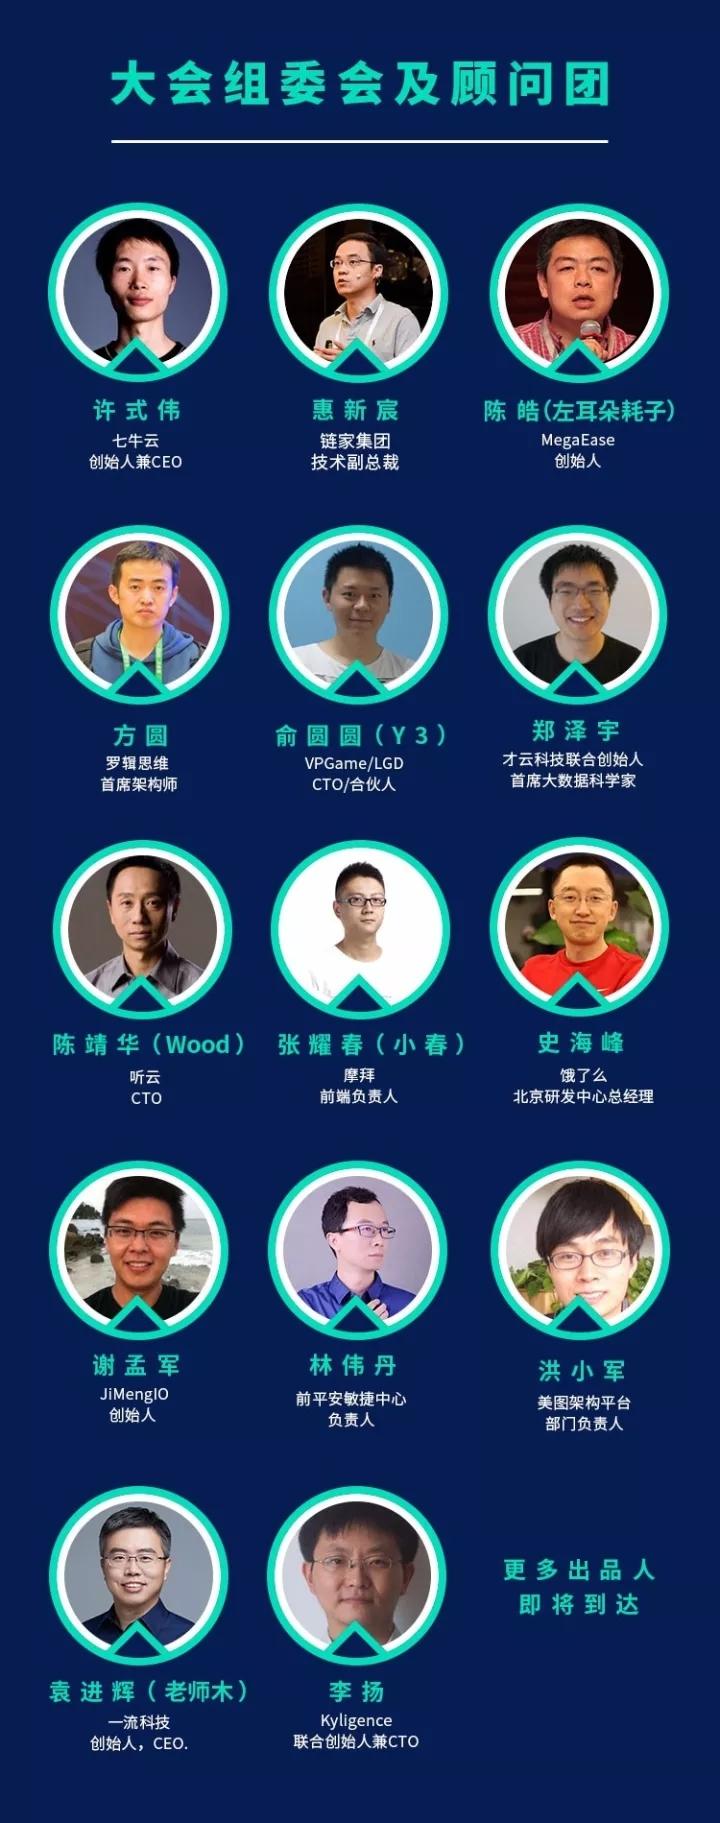 GIAC 2017全球互联网架构大会